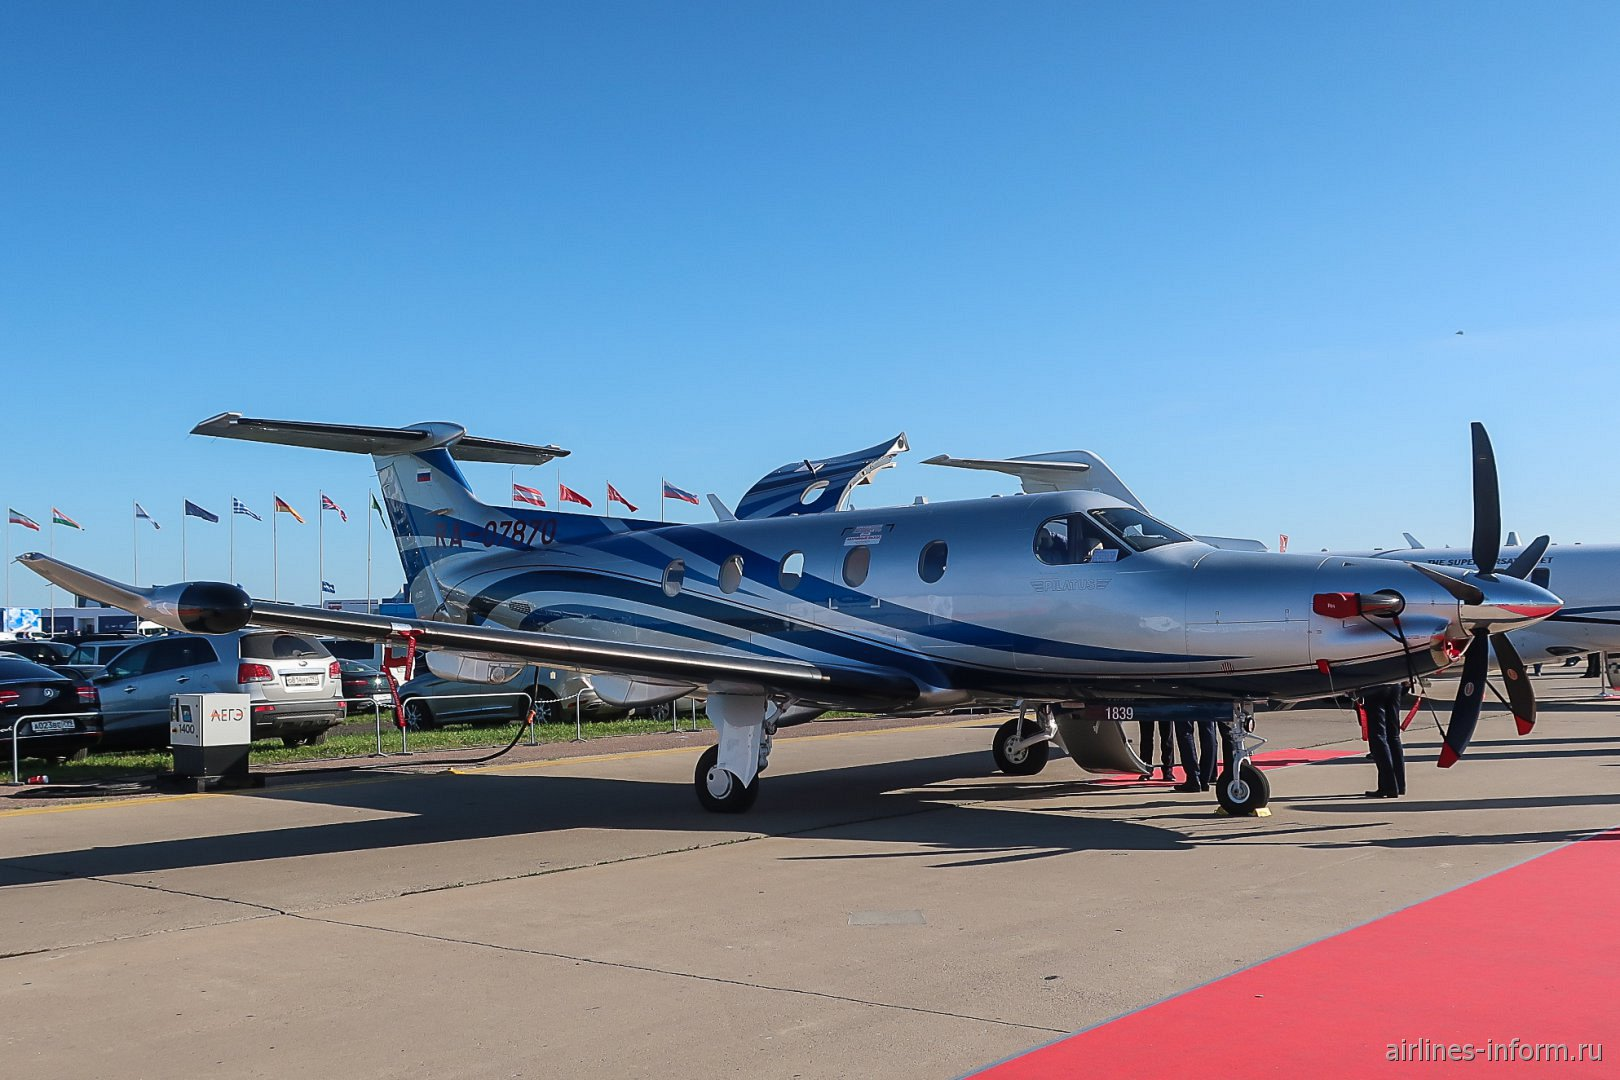 Самолет Pilatus PC-12 на авиасалоне МАКС-2019